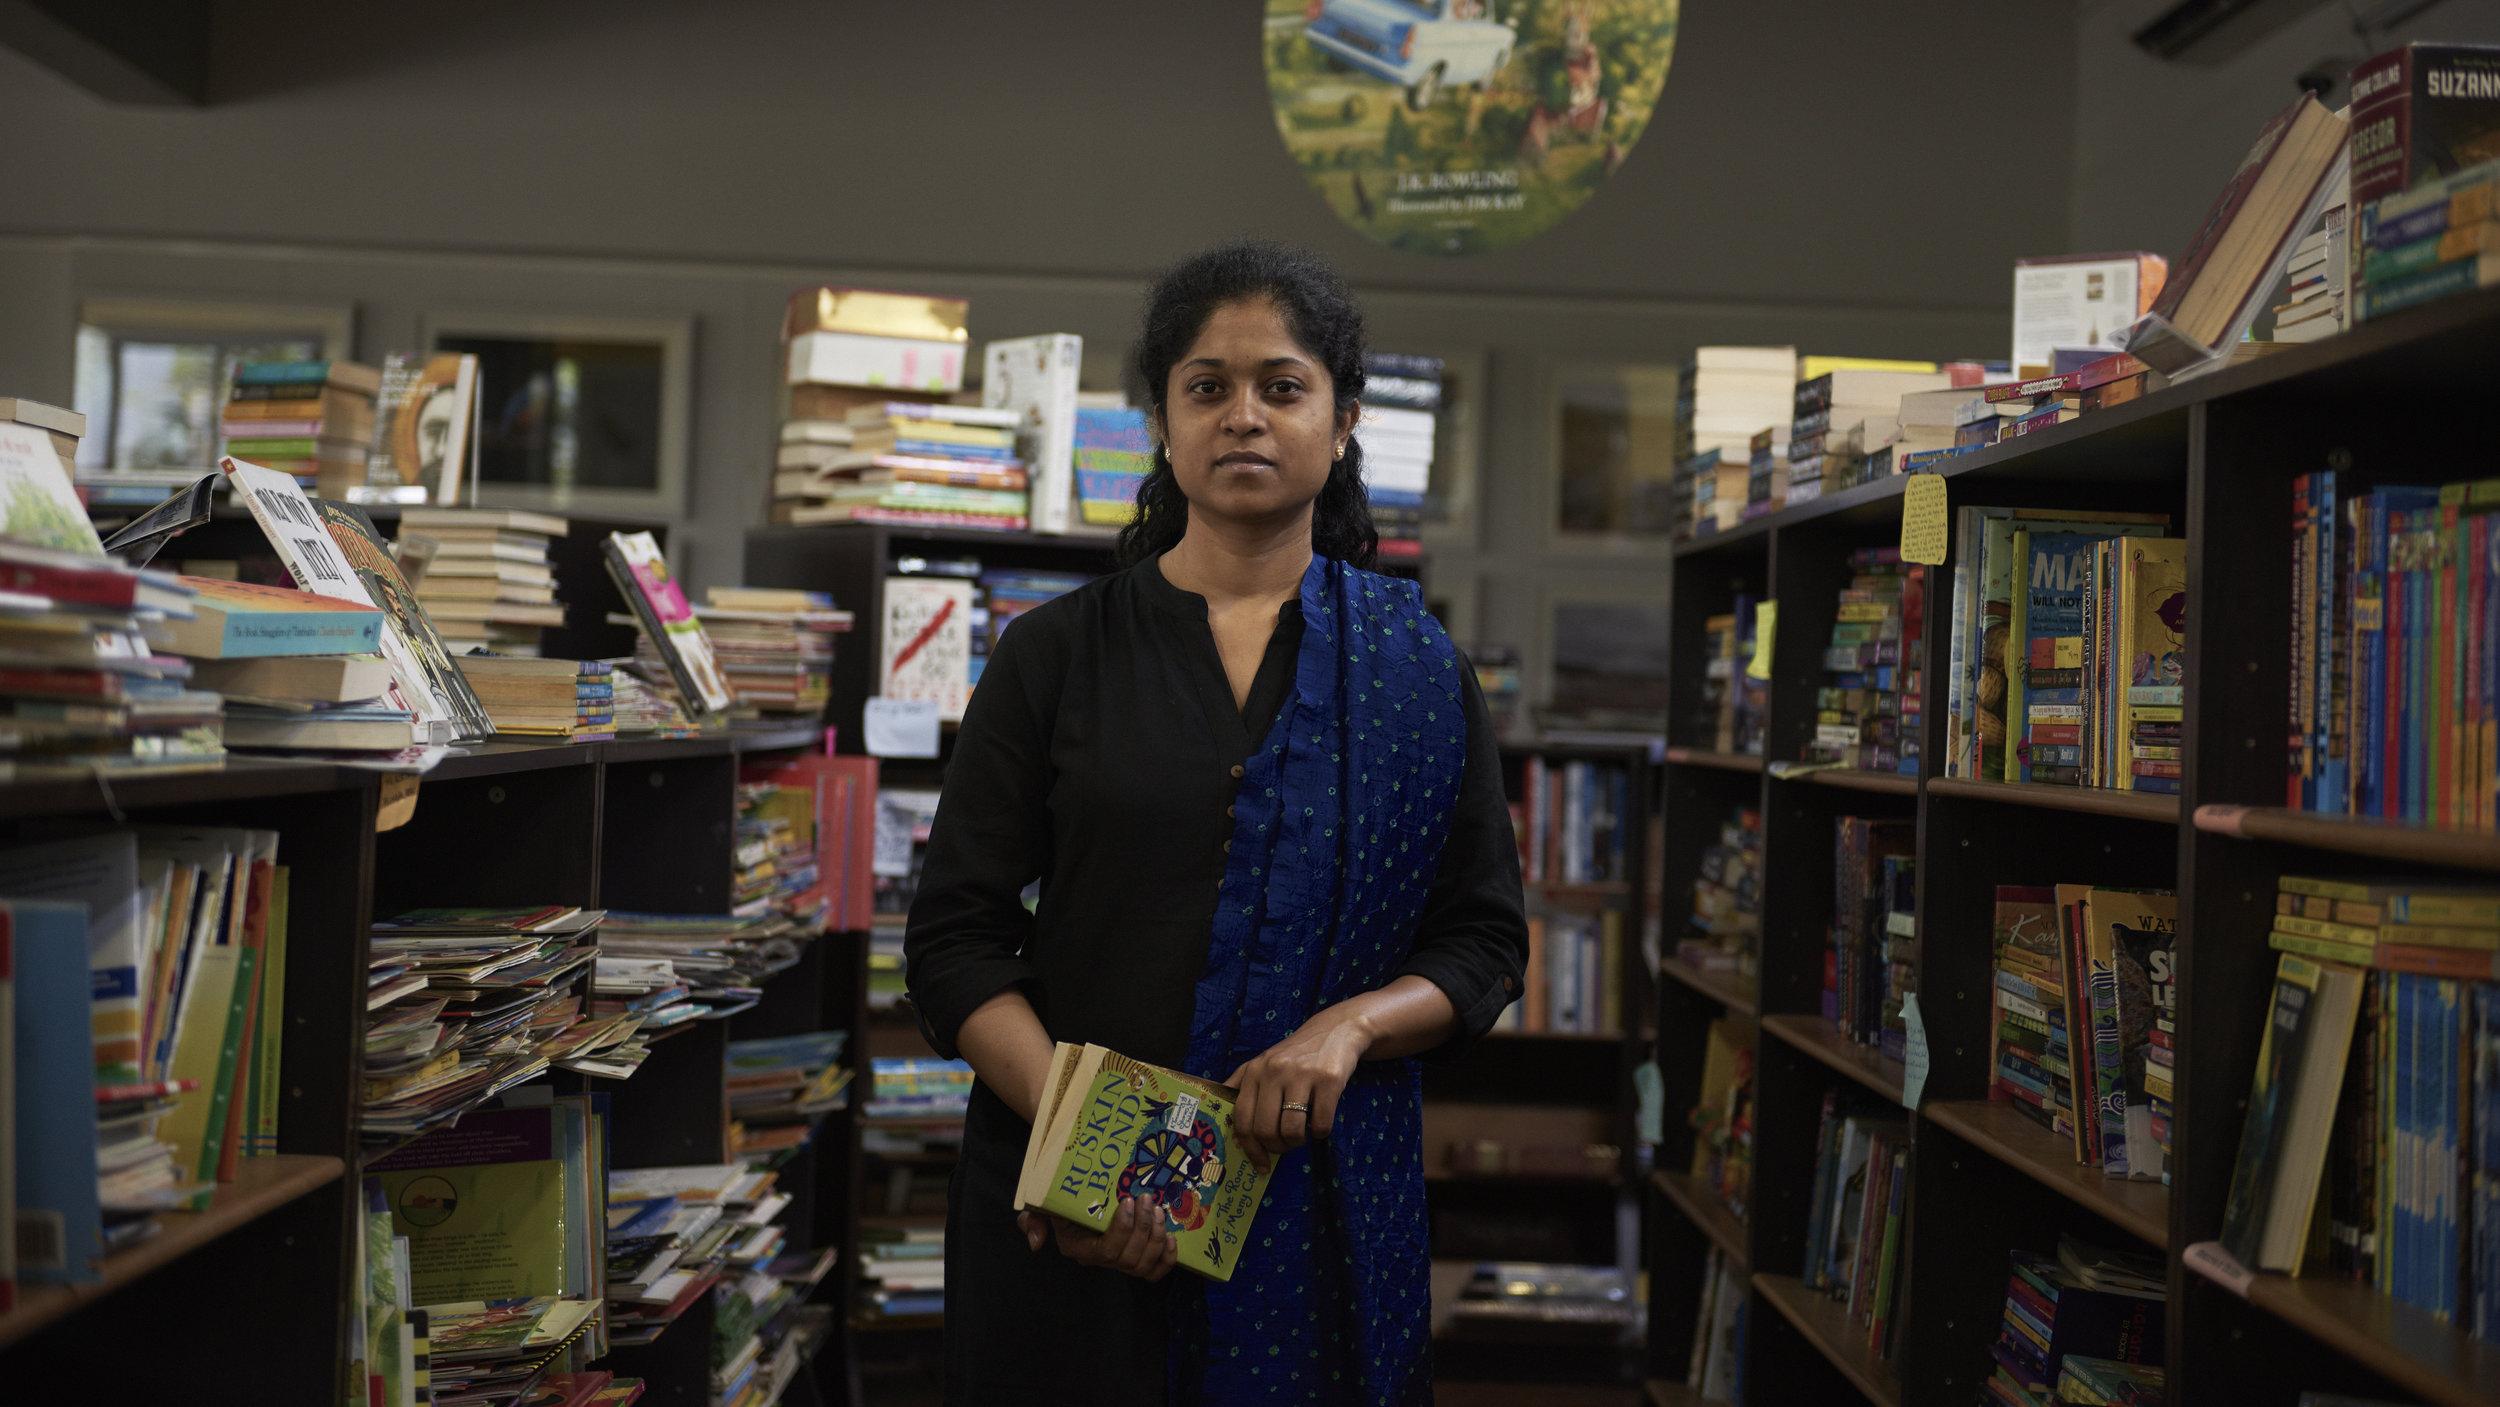 Ahalya Naidu and Meethil Momaya run this beautiful space in Lower Parel.